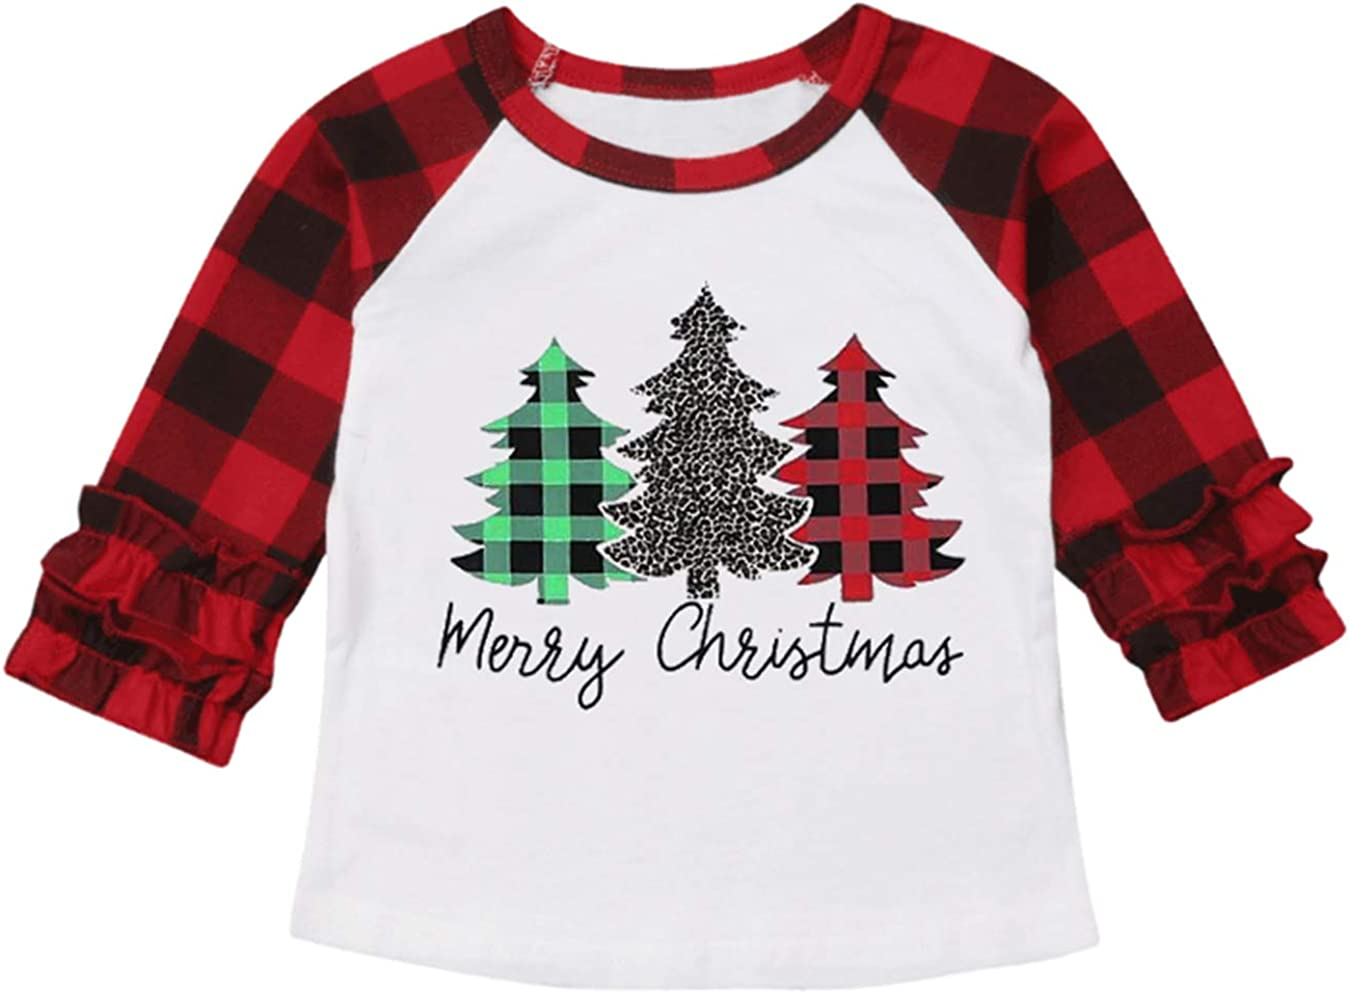 UNIQUEONE Baby Girls Boys Merry Christmas T-Shirt Christmas Truck Tree Print Tops Long Sleeve Raglan Tee